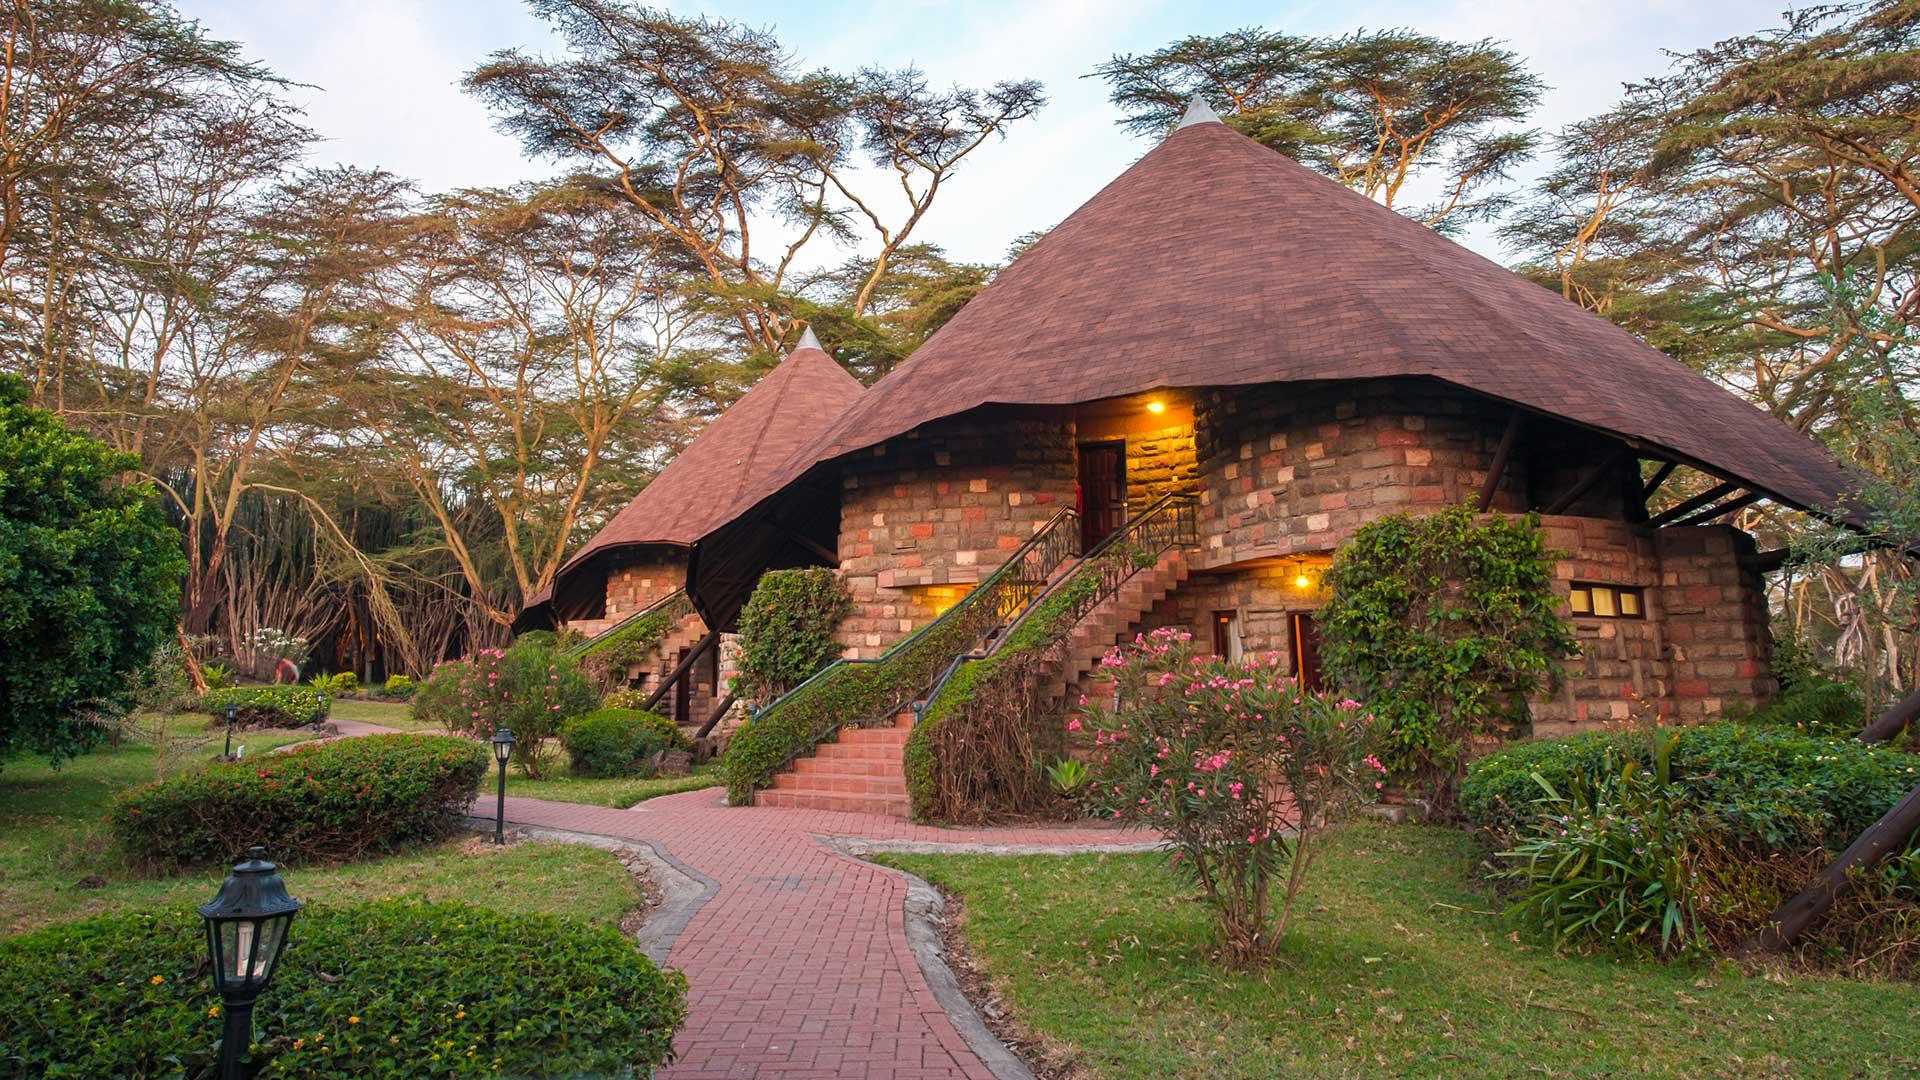 Lake Naivasha Sopa Resort - Kichaka Tours and Travel Kenya